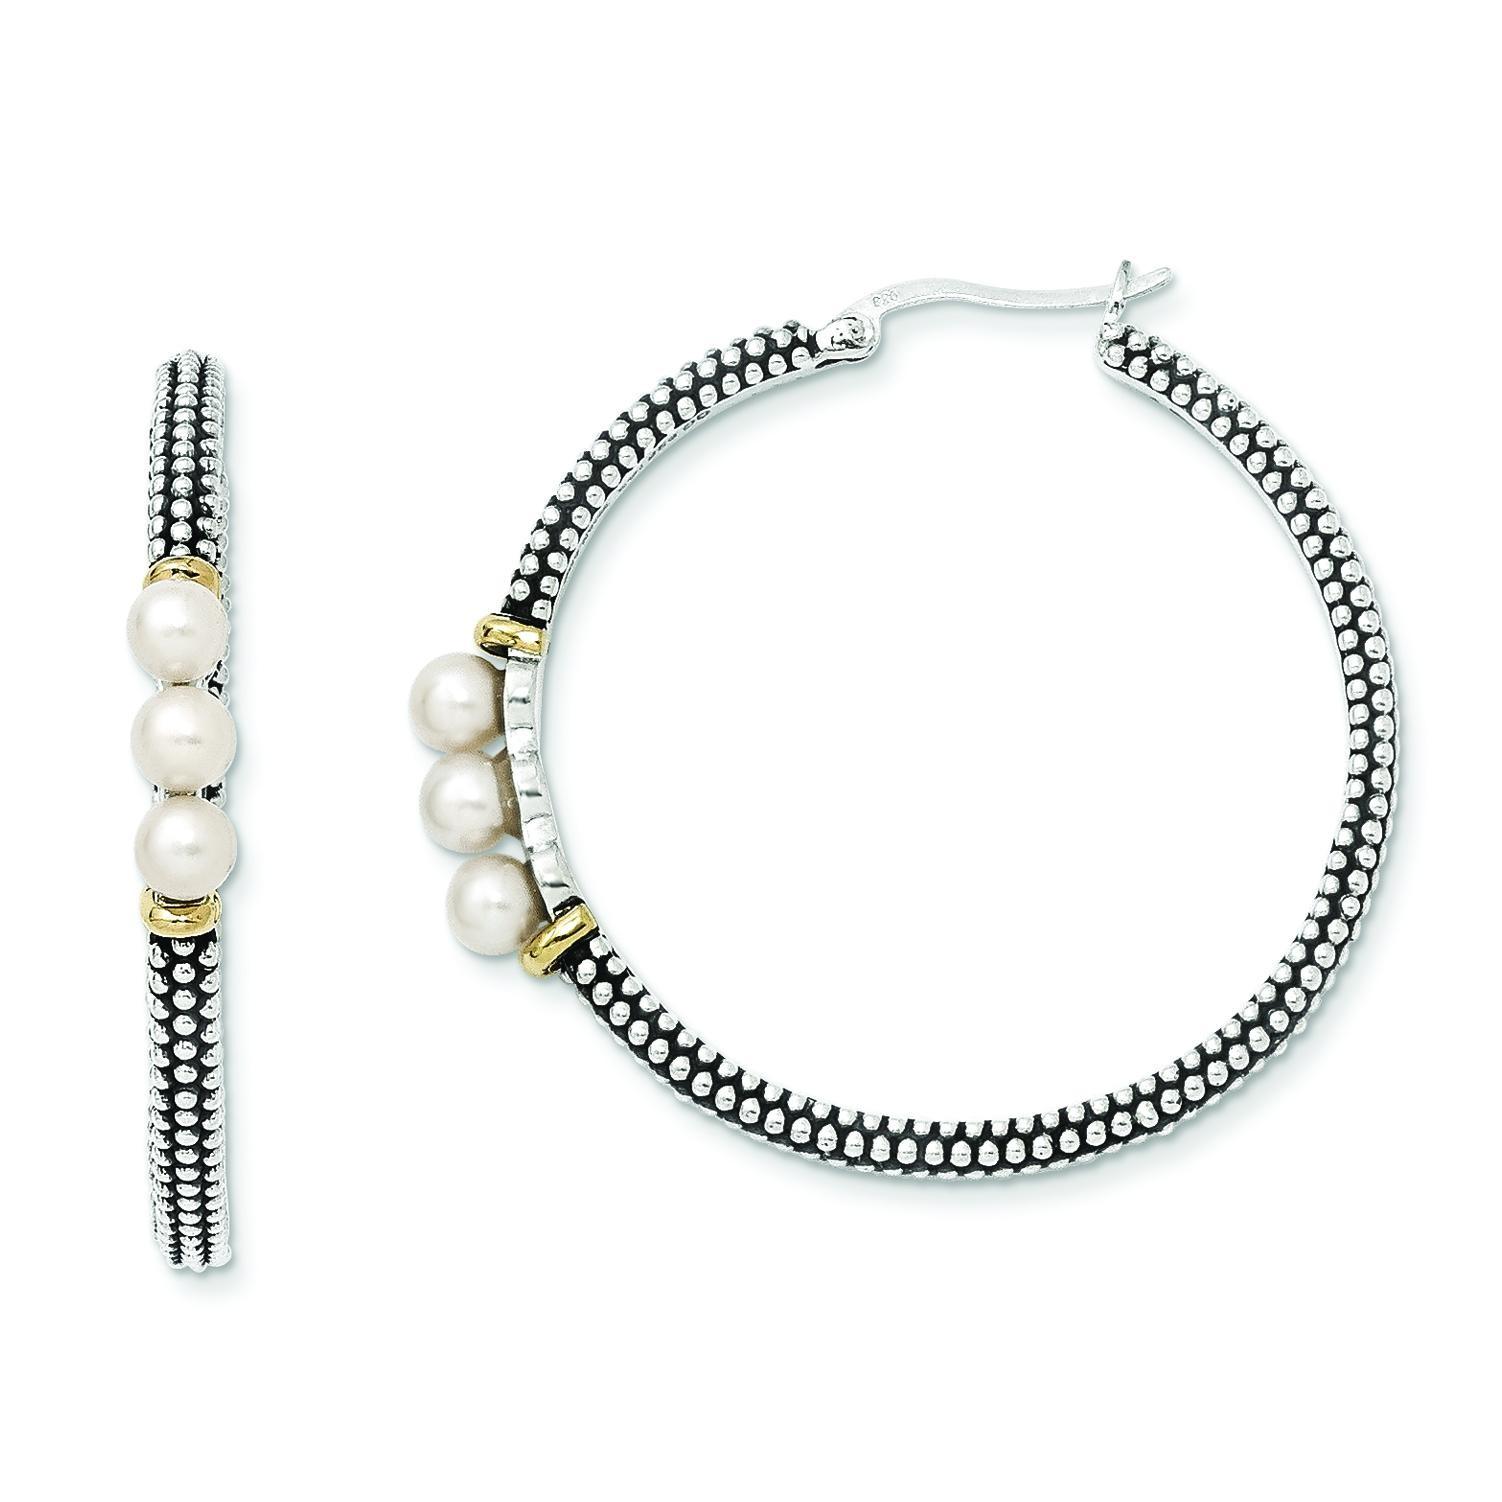 W Button Fresh Water Cultured Pearl Hoop Earrings in 14k Yellow Gold & Sterling Silver